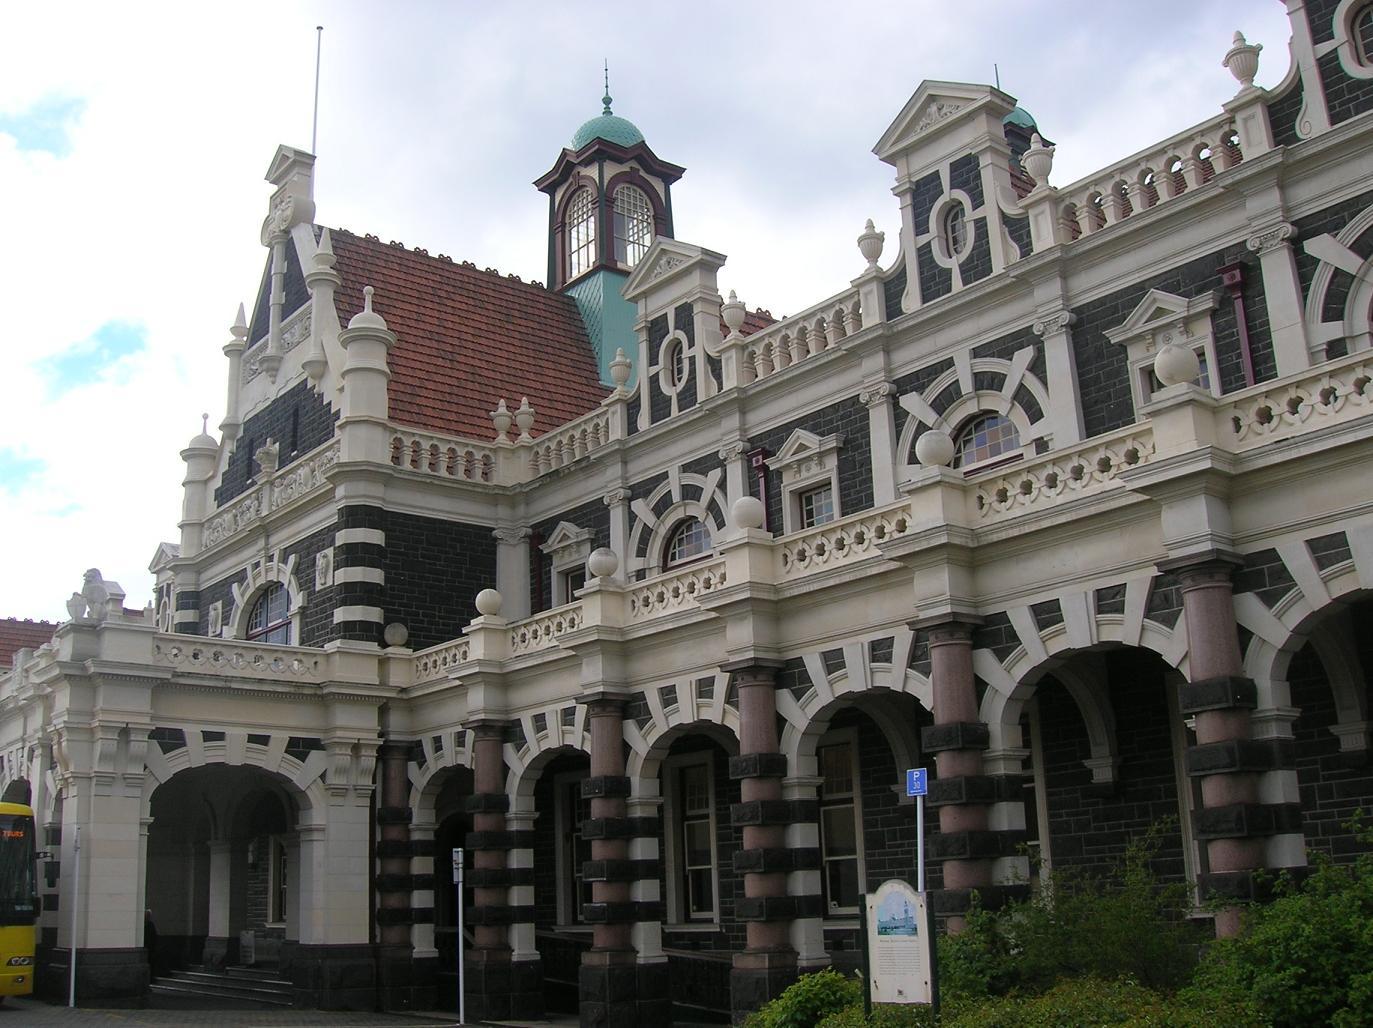 Dunedin Railway Station 2